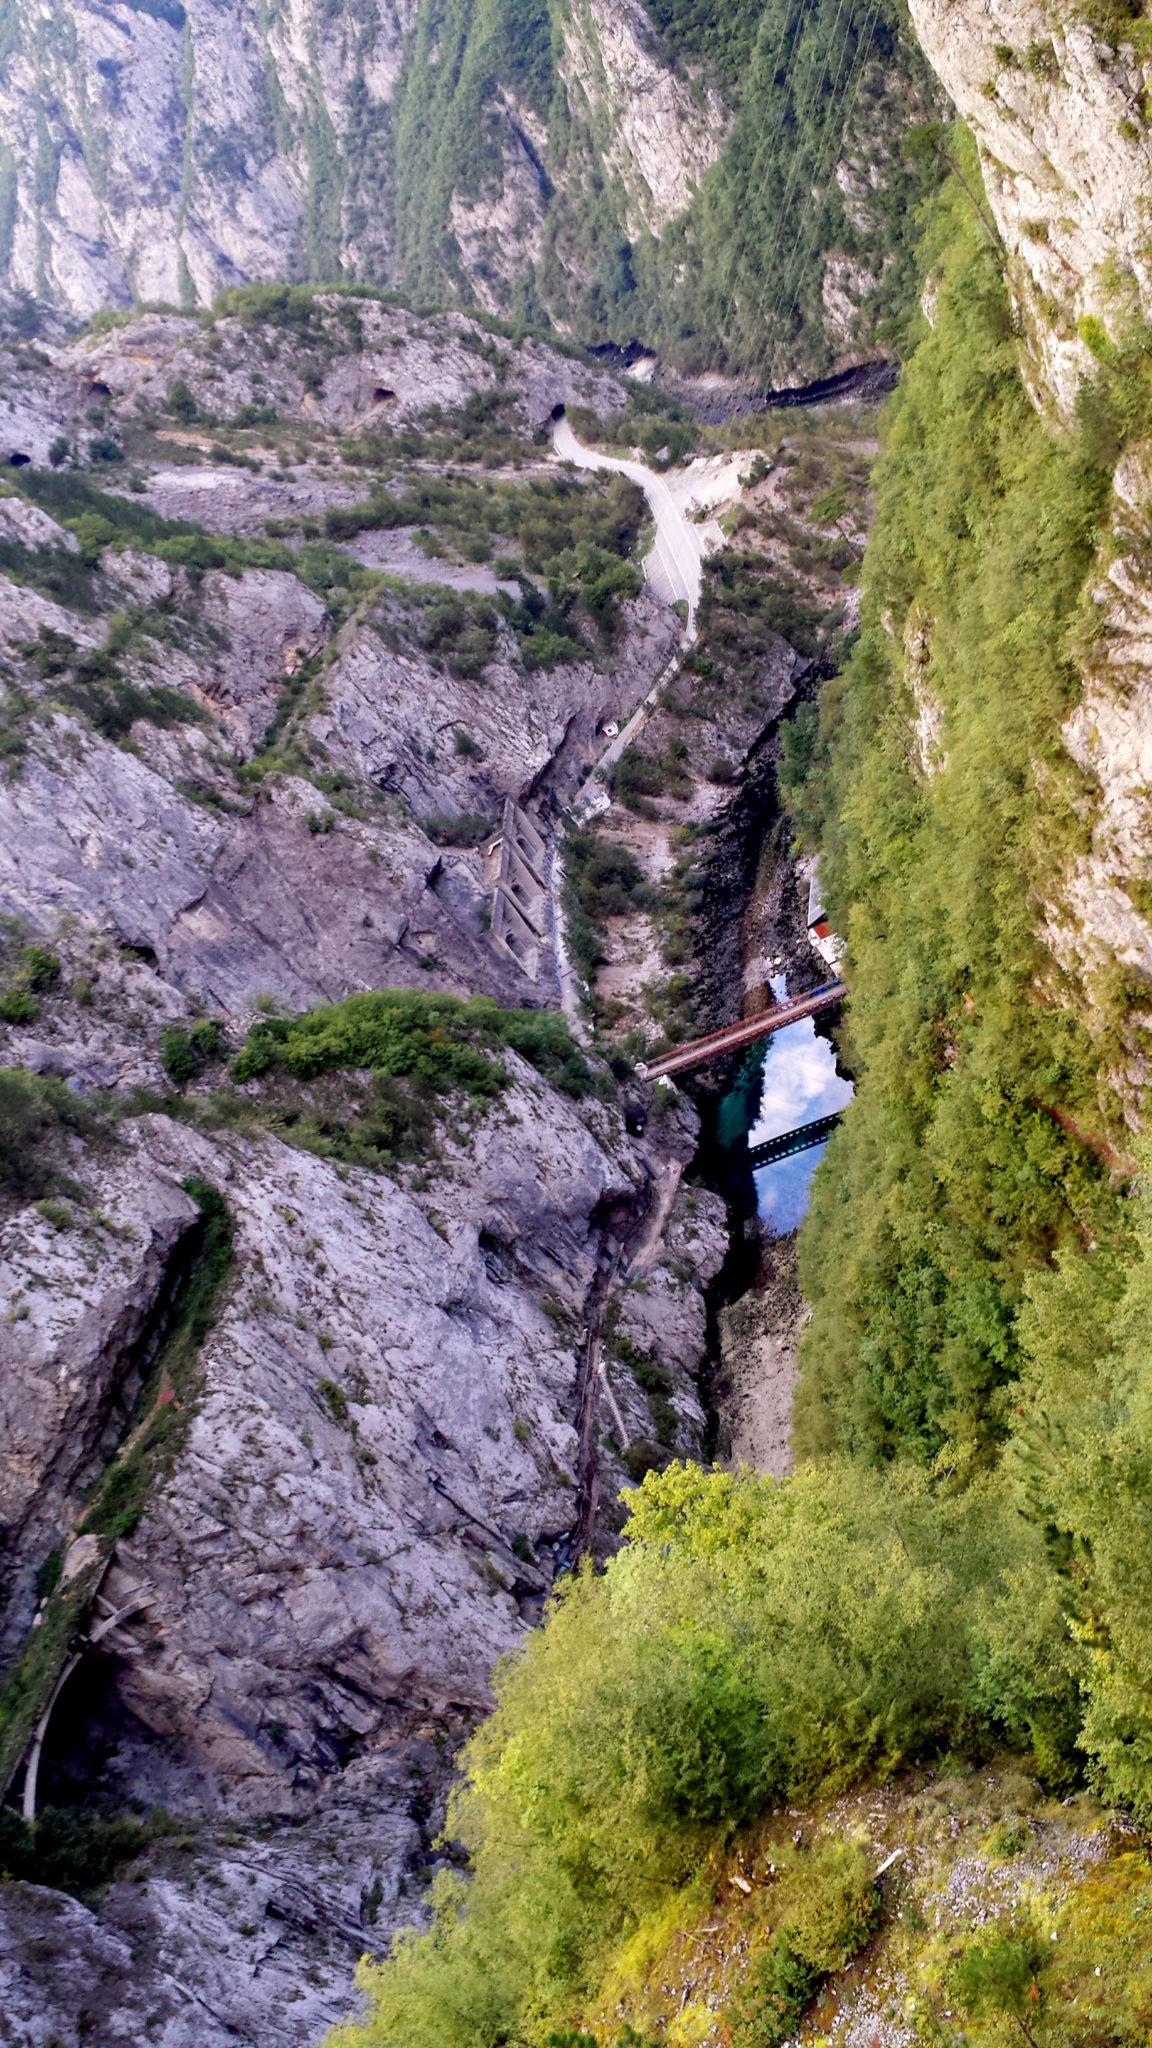 Hemaposesesvalises_montenegro_scepan_polje_travel_voyage_blog6